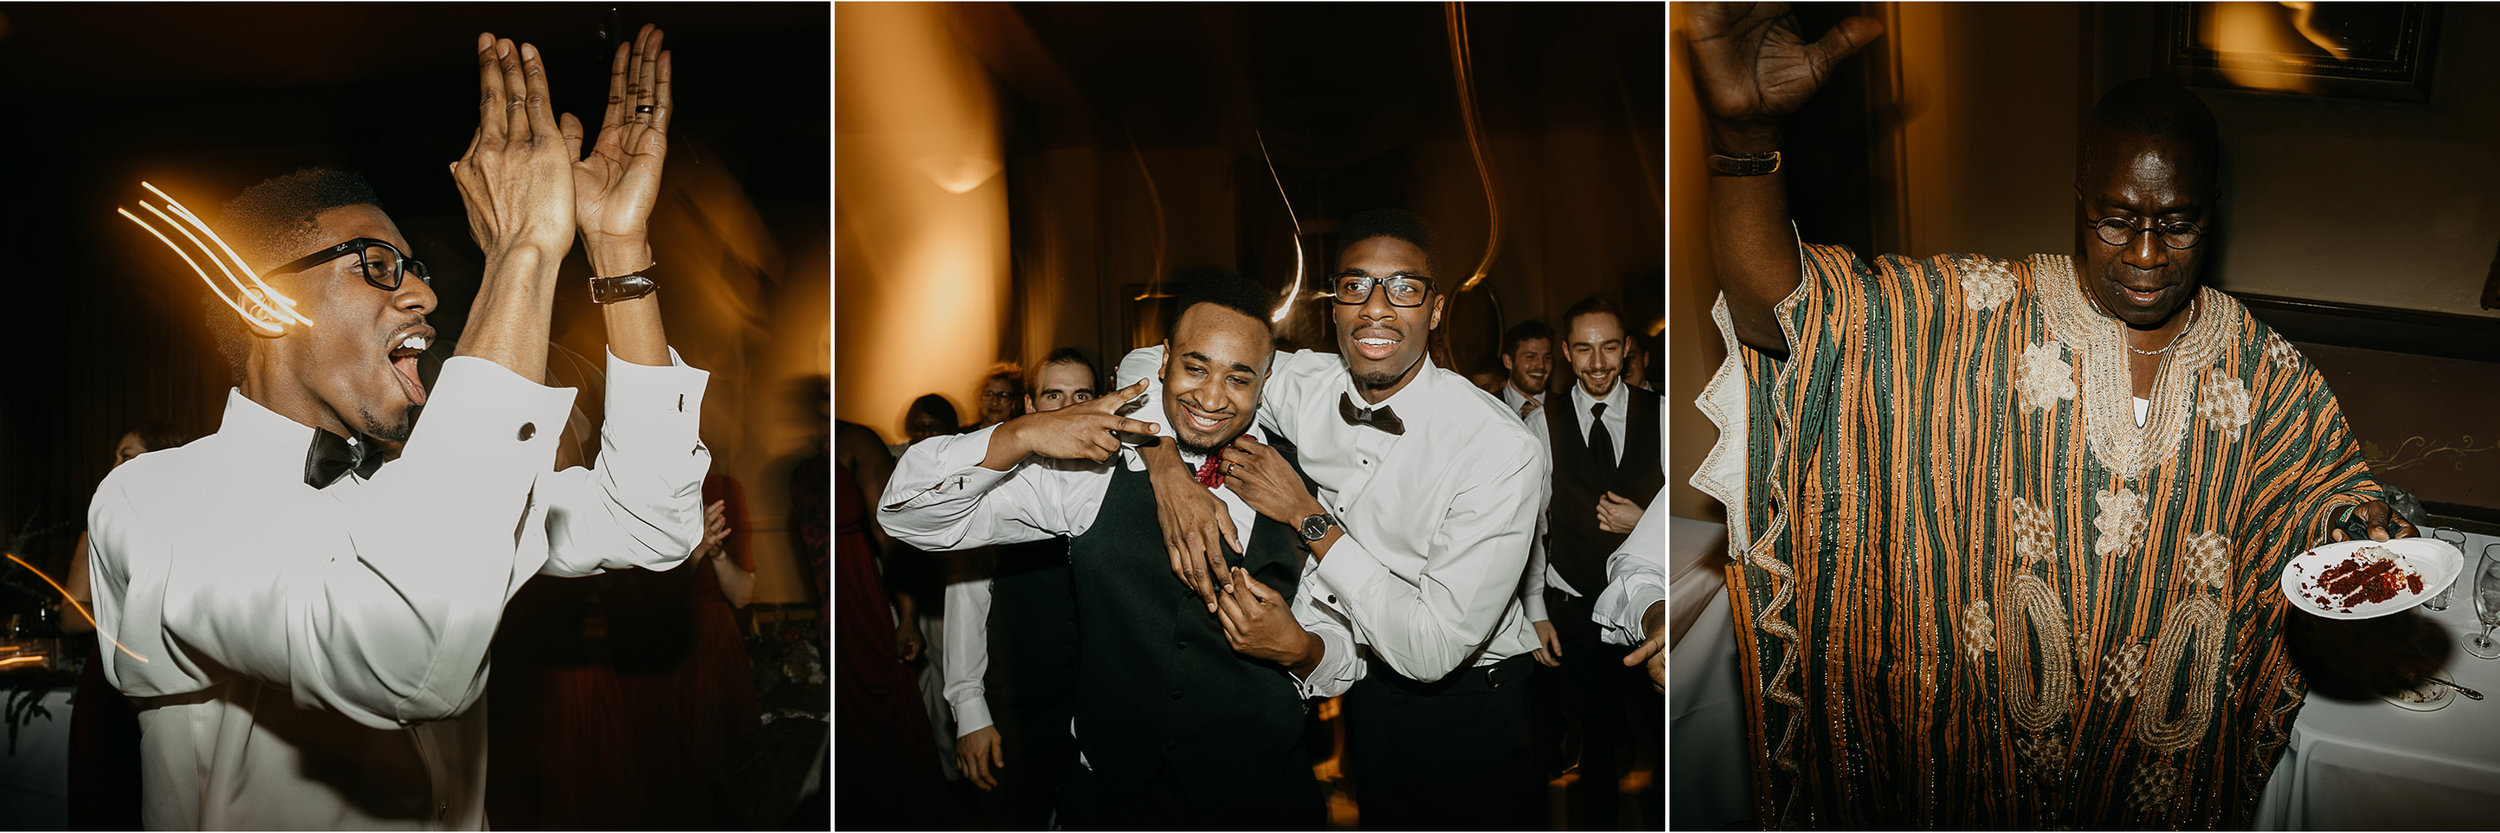 portland - wedding - photographer 23.jpg